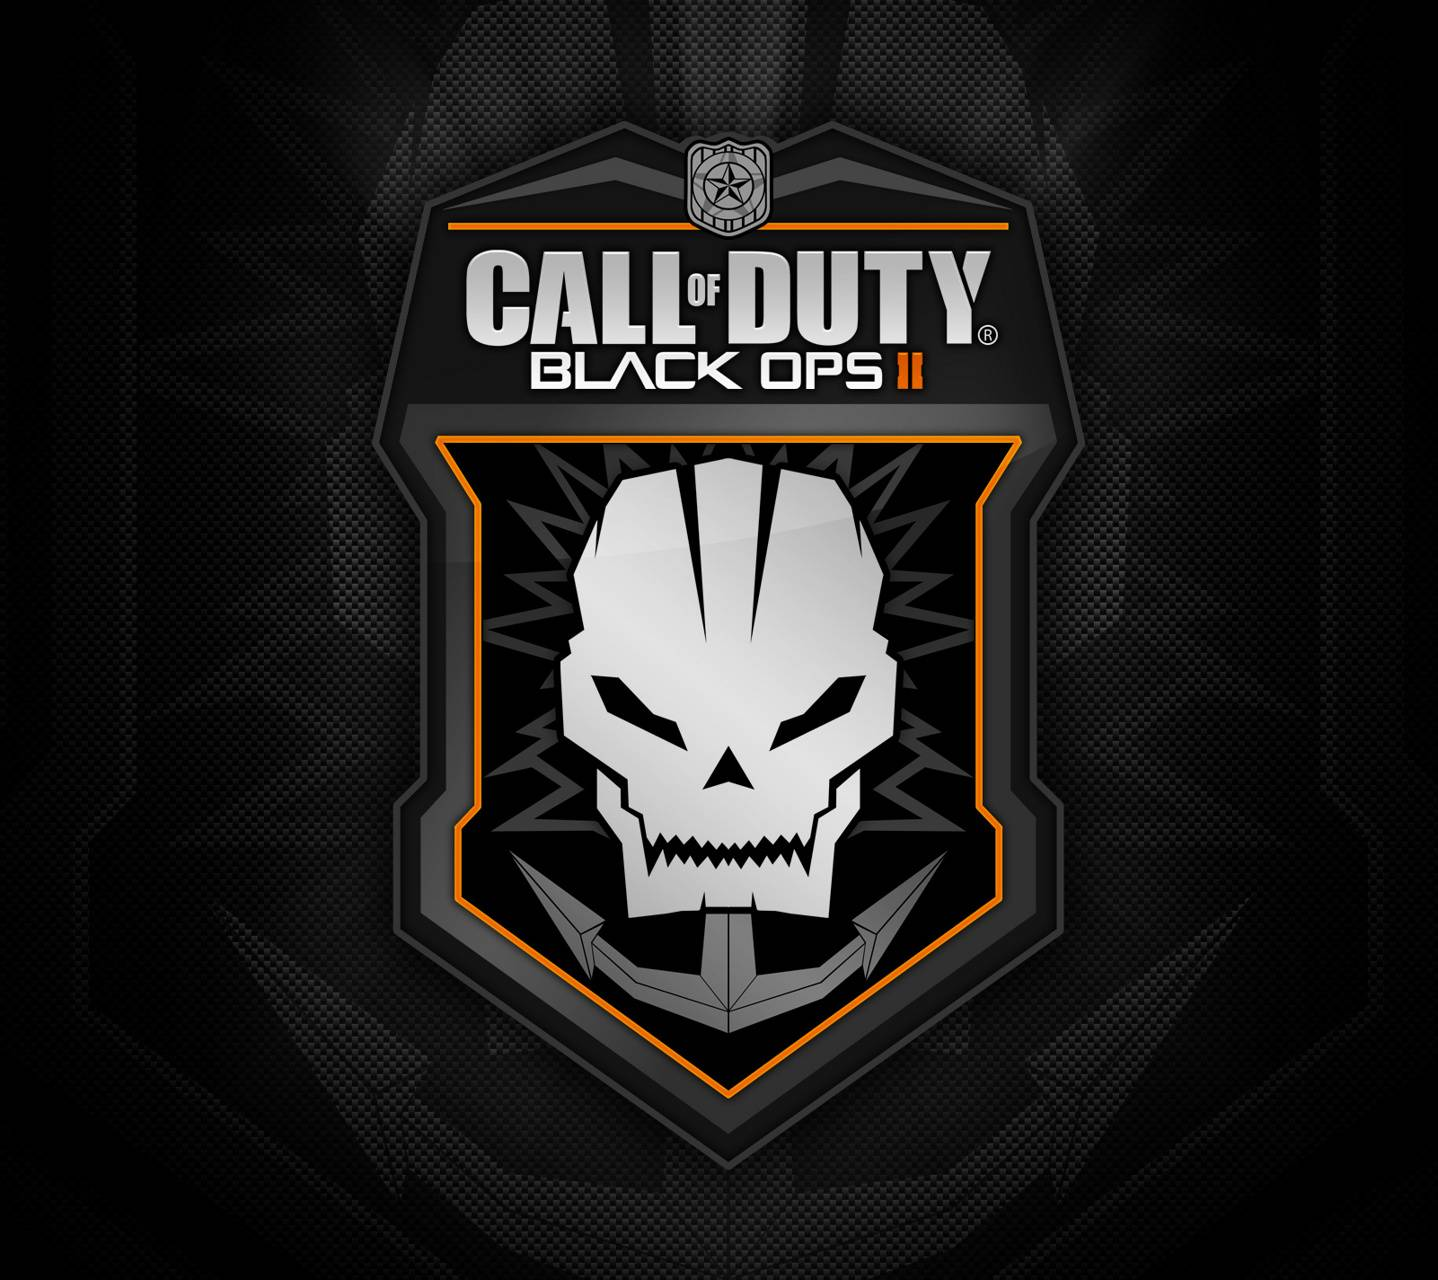 Black Ops 2 Wallpaper By Ilovedub4 9b Free On Zedge